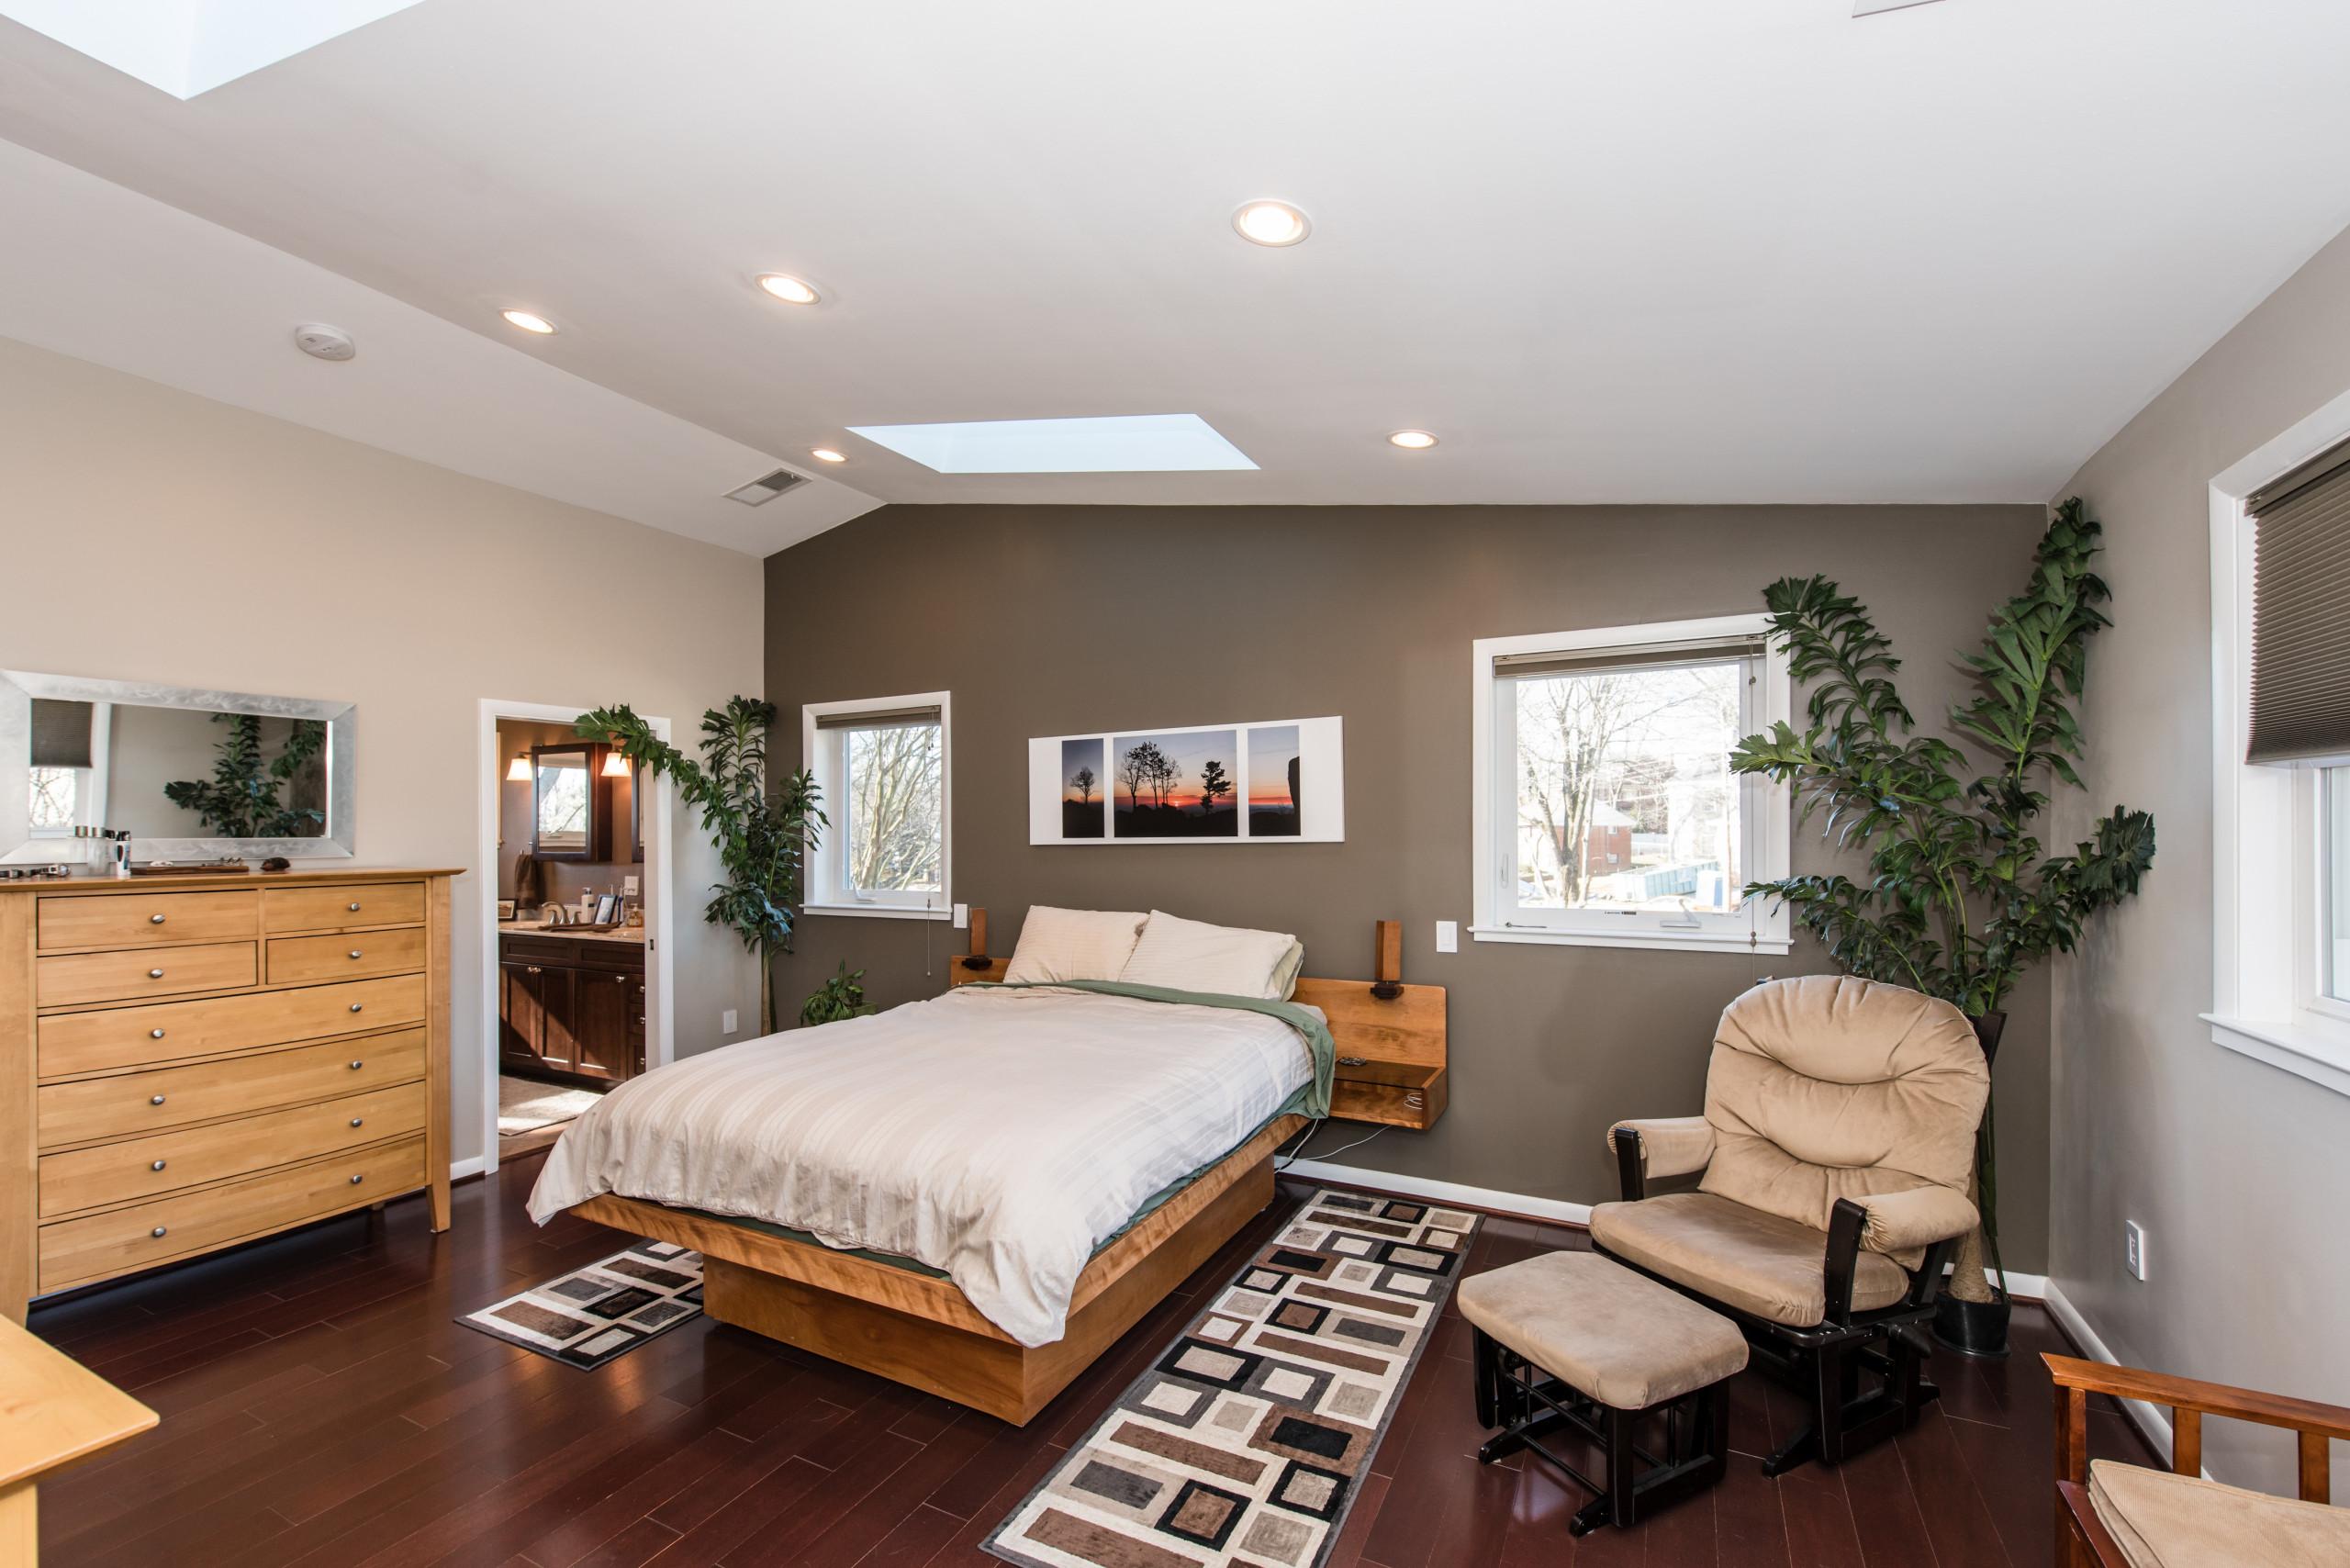 Home Remodel/Renovation in McLean, VA